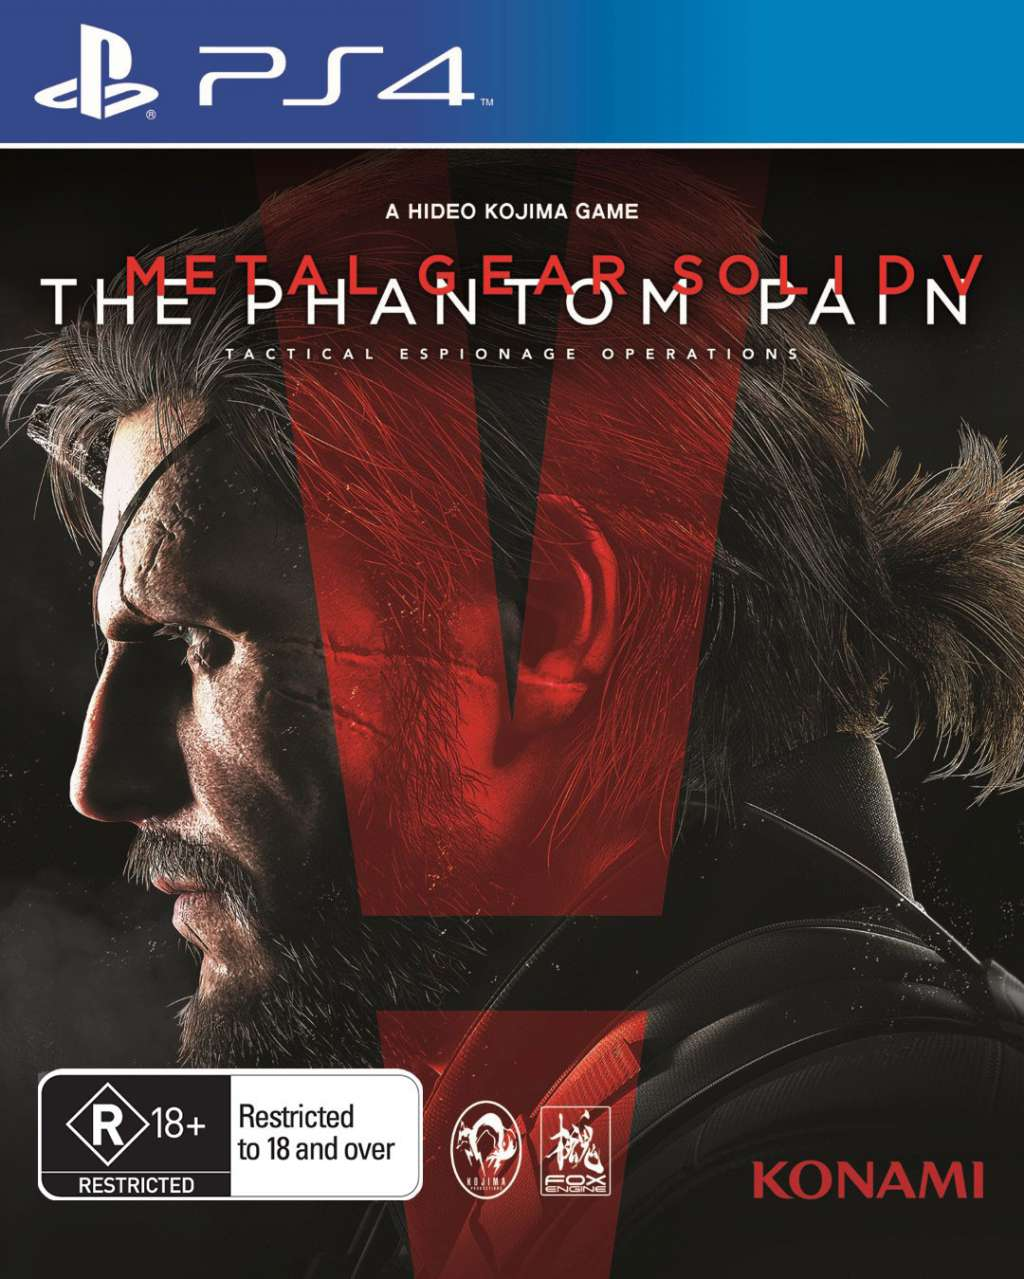 Metal Gear Solid V The Phantom Pain PS4 Portada